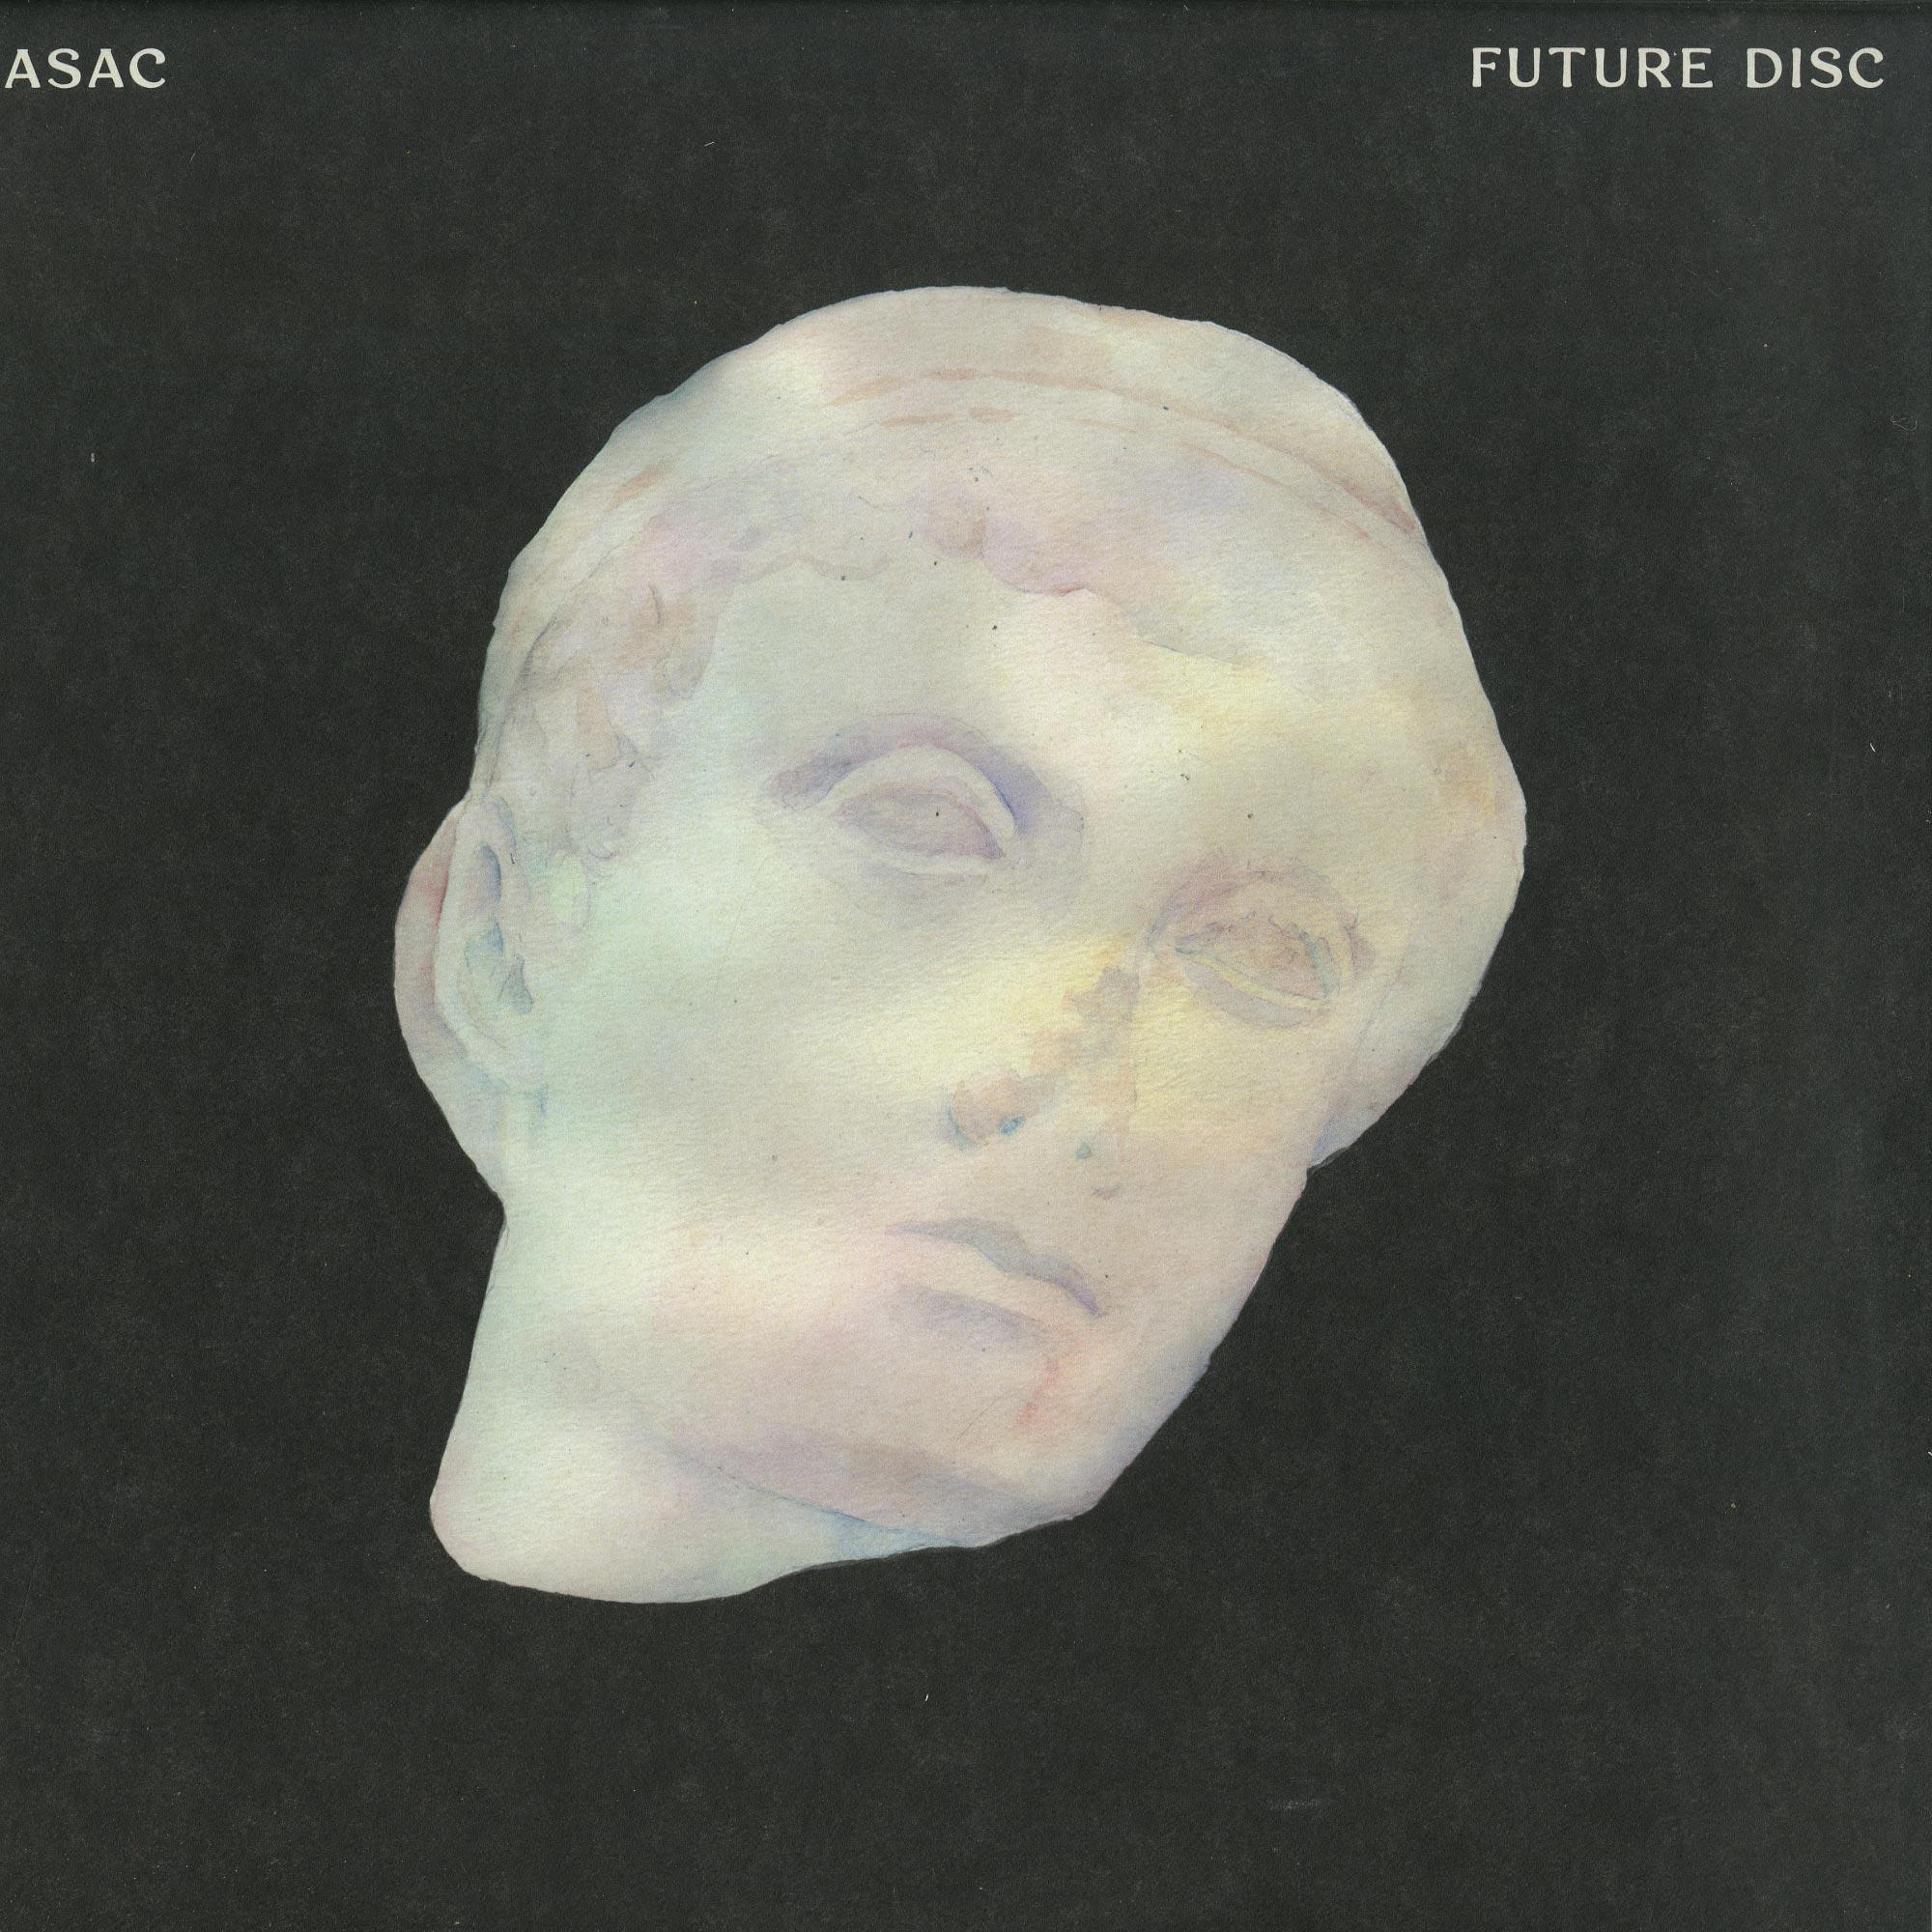 Sasac - FUTURE DISC LP